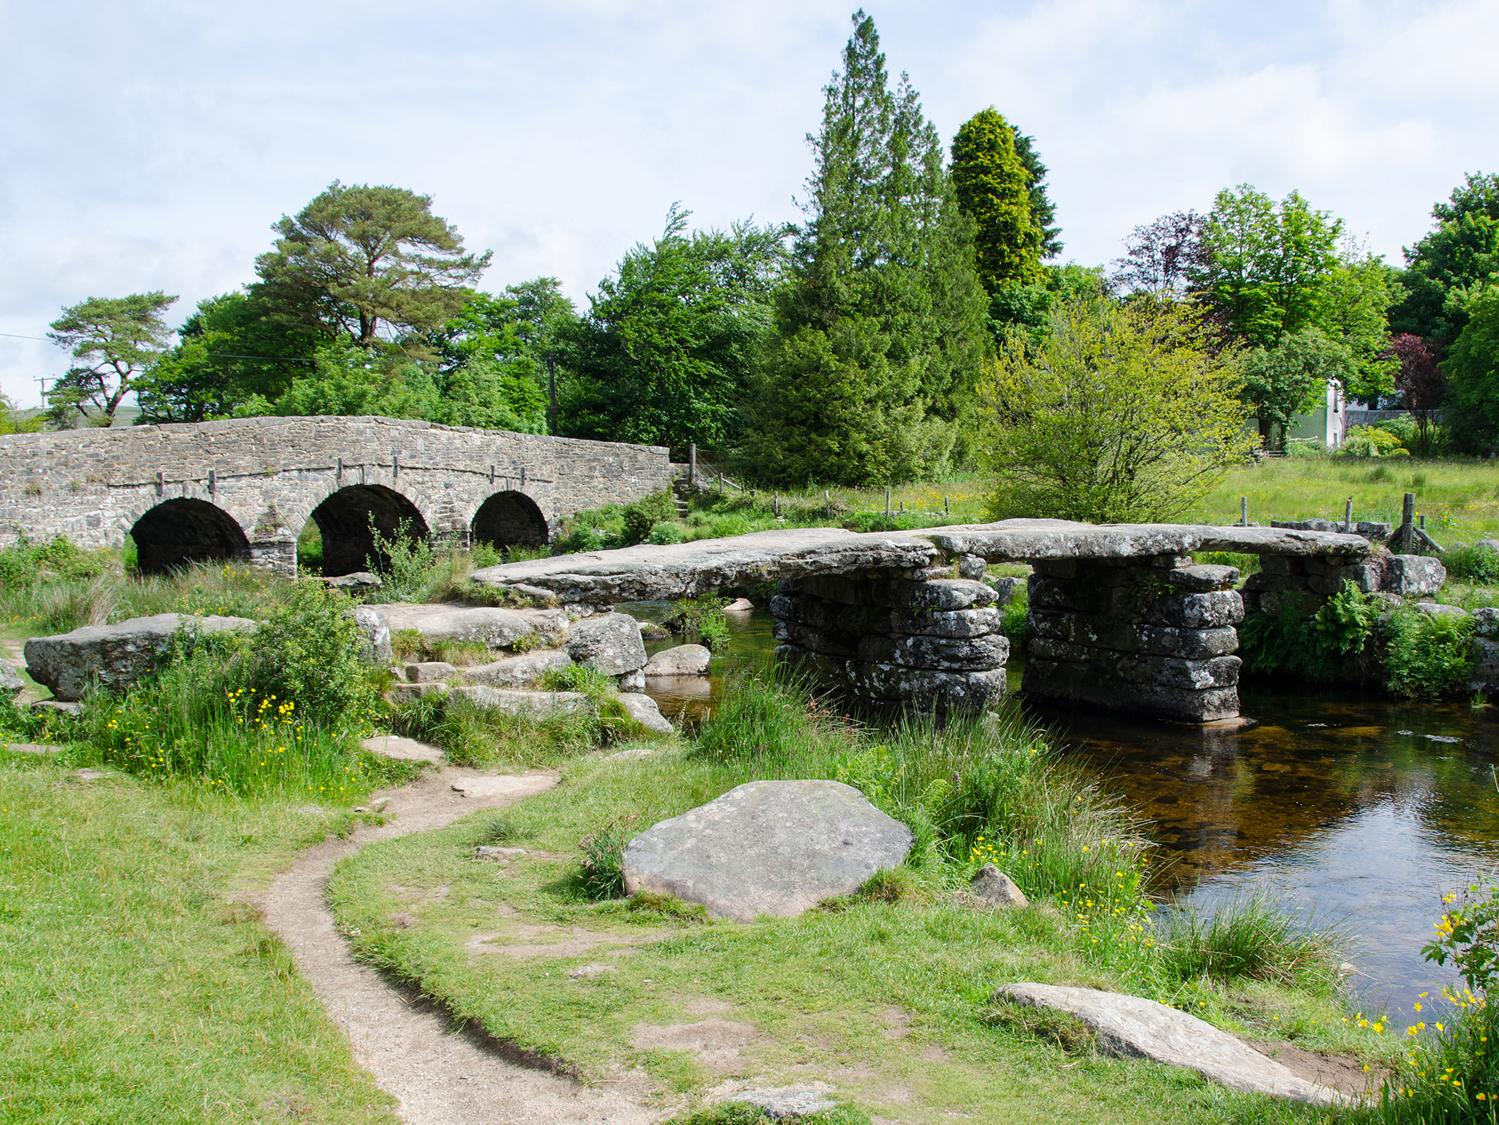 Drewstone Arches